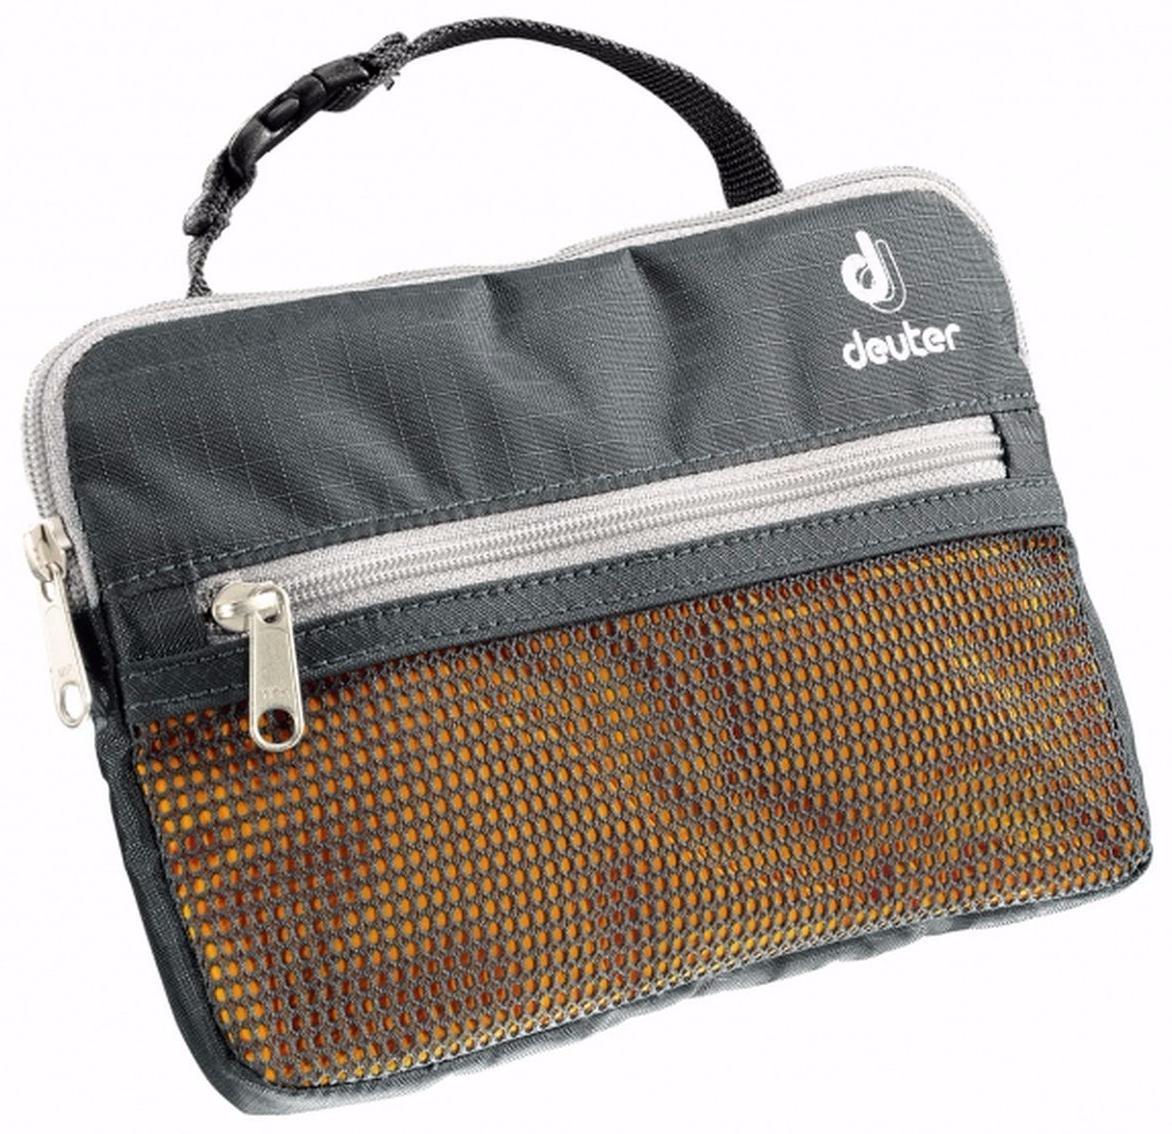 Косметичка Deuter 2015 Accessories Wash Bag Lite Granite от КАНТ